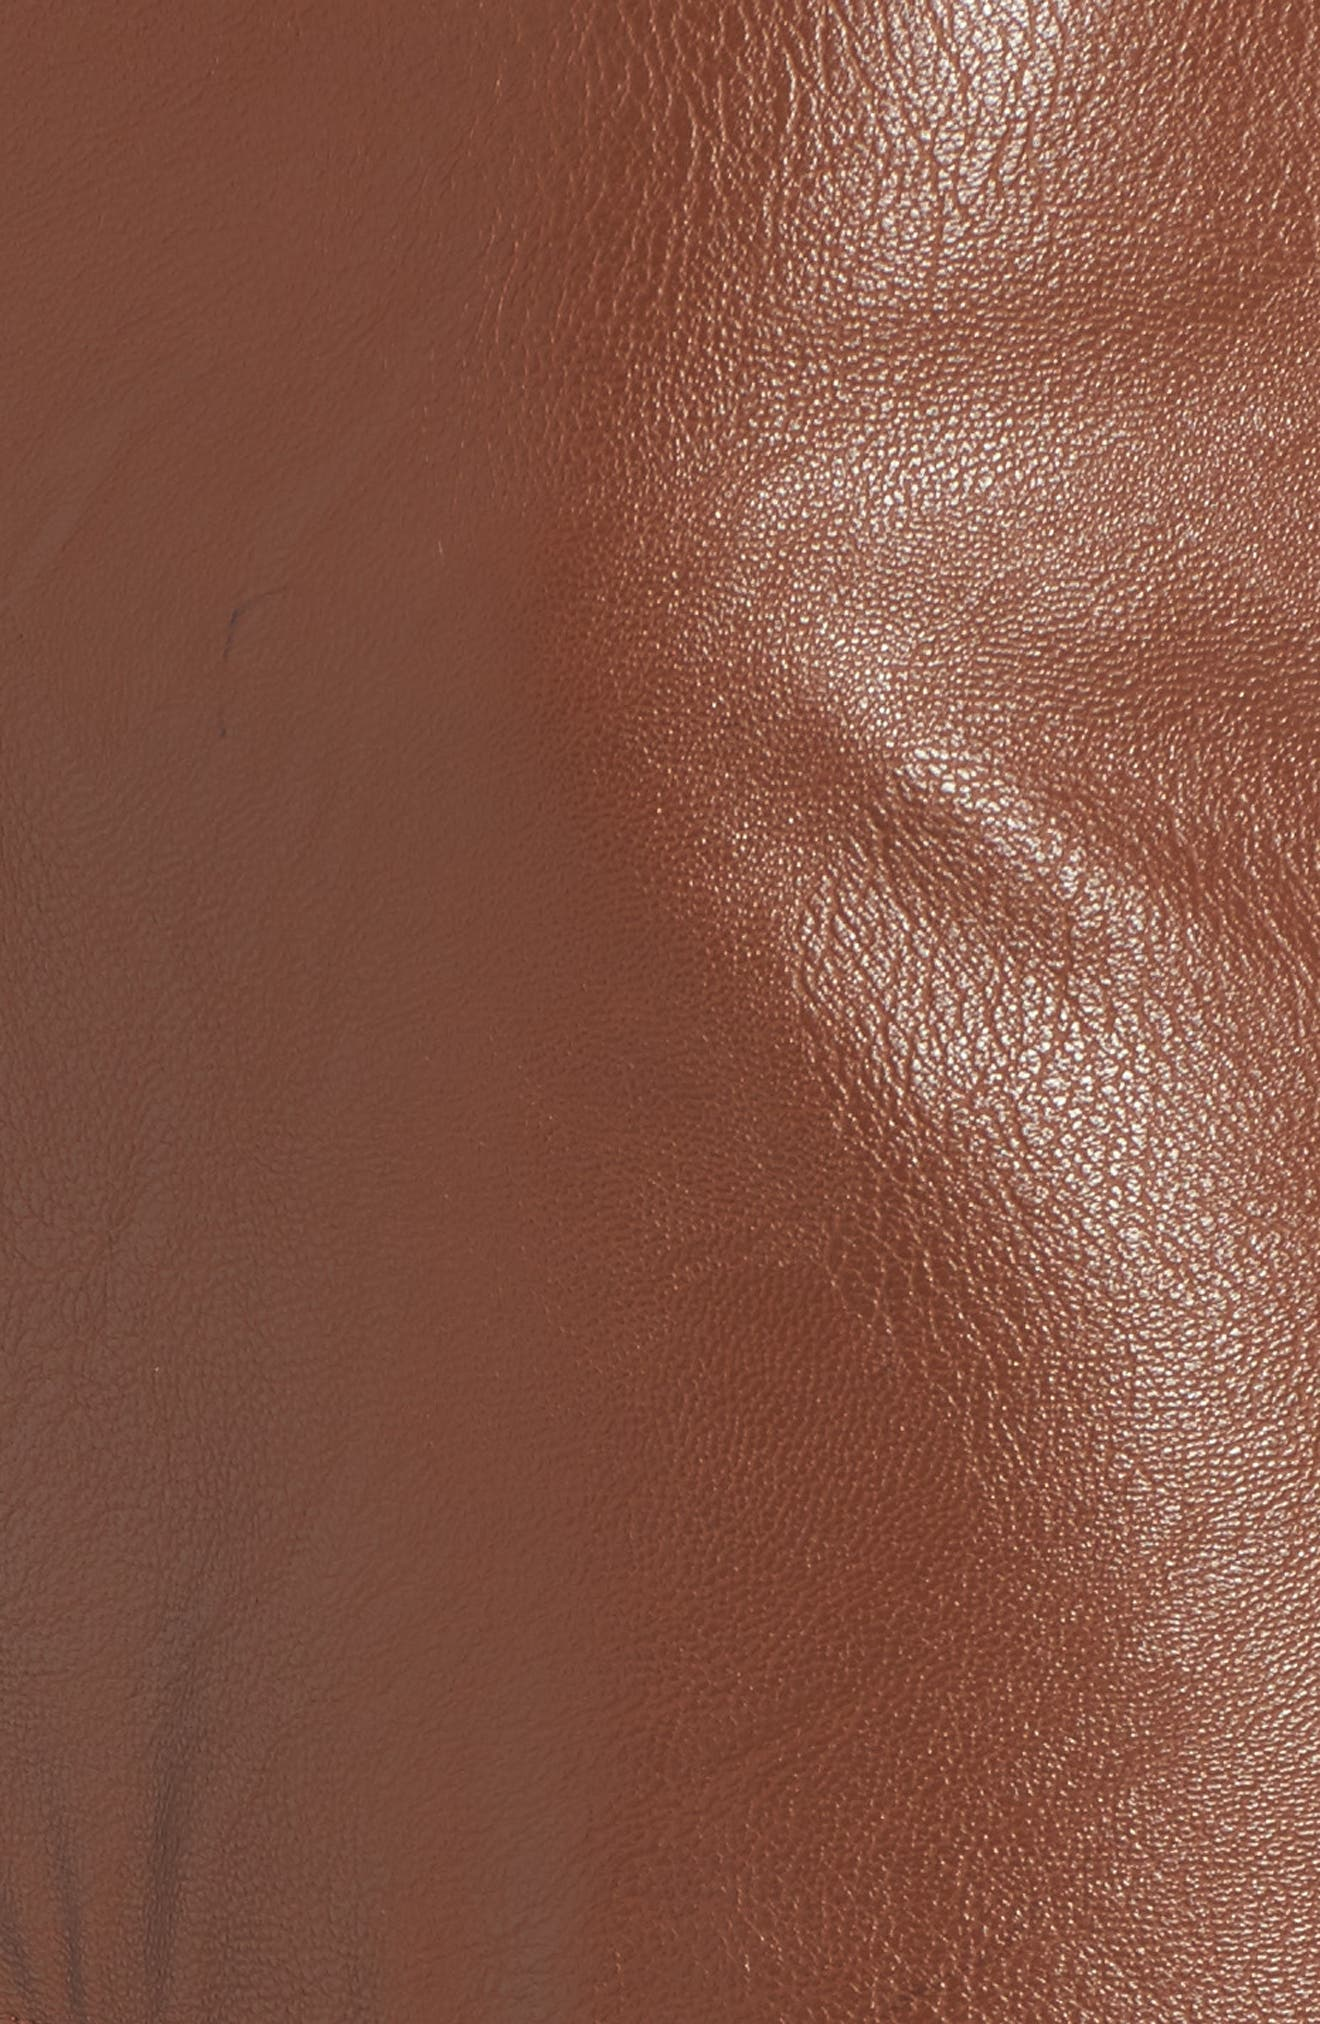 Ruffle Hem Faux Leather Skirt,                             Alternate thumbnail 5, color,                             204